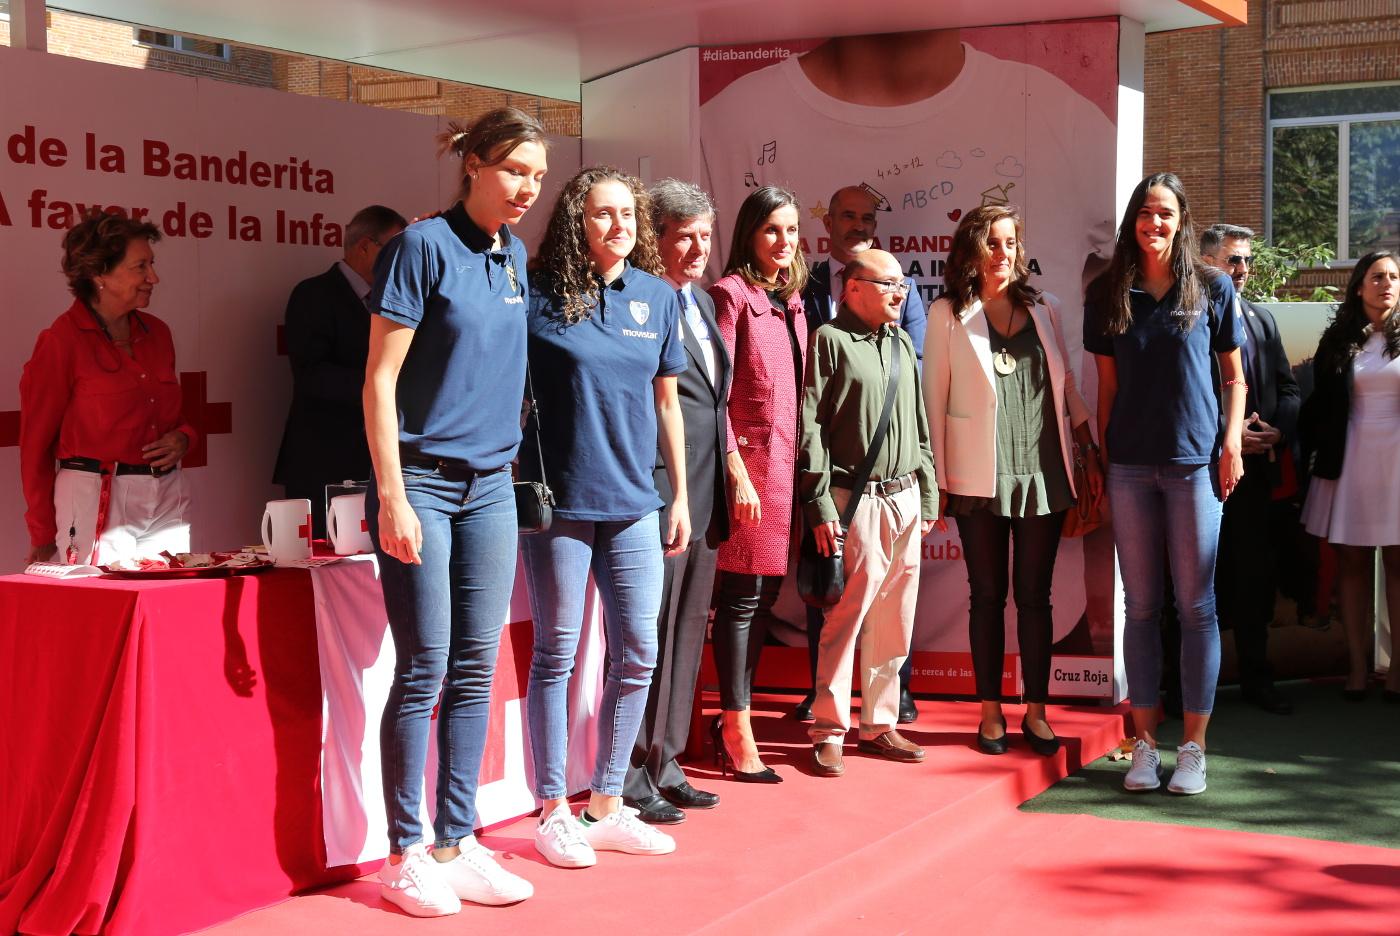 Letizia la reina m s motera for Beca de comedor valencia